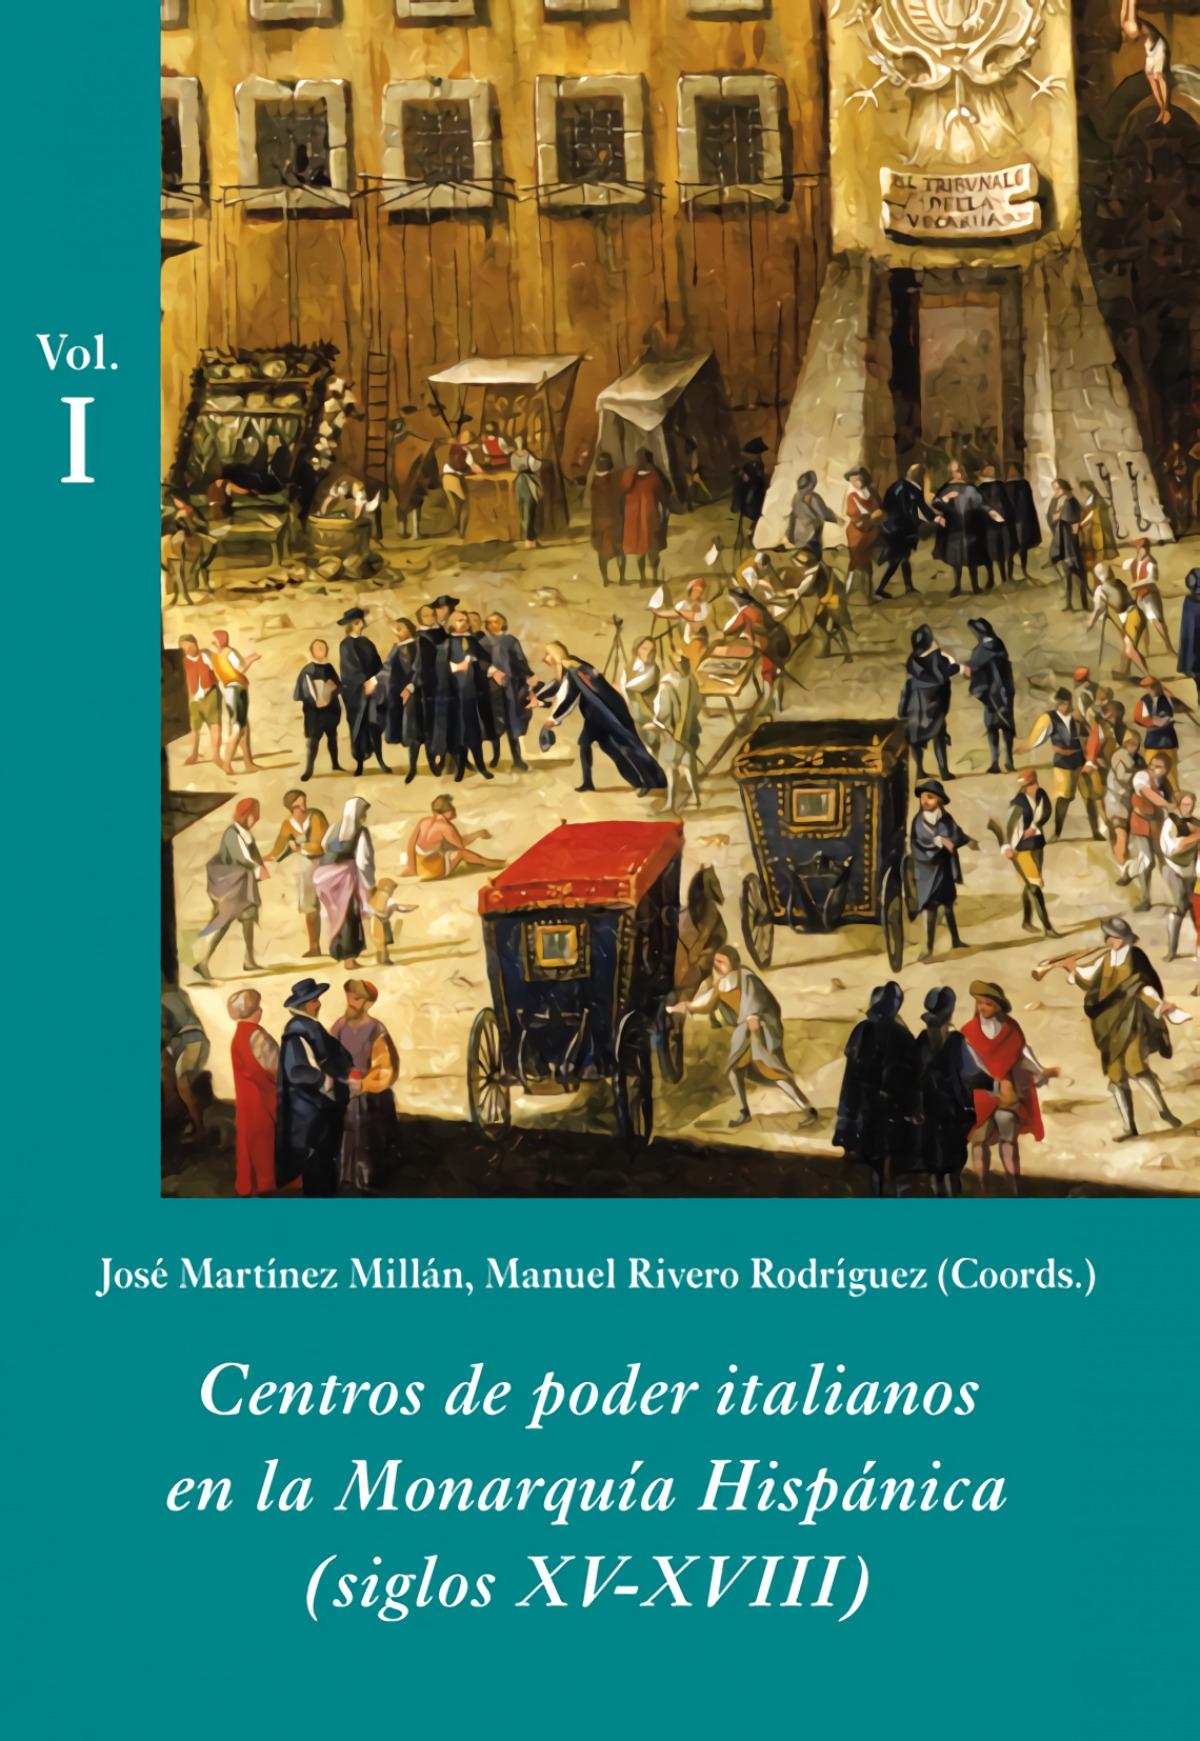 CENTROS DE PODER ITALIANOS ESTUCHE -3 VOLS